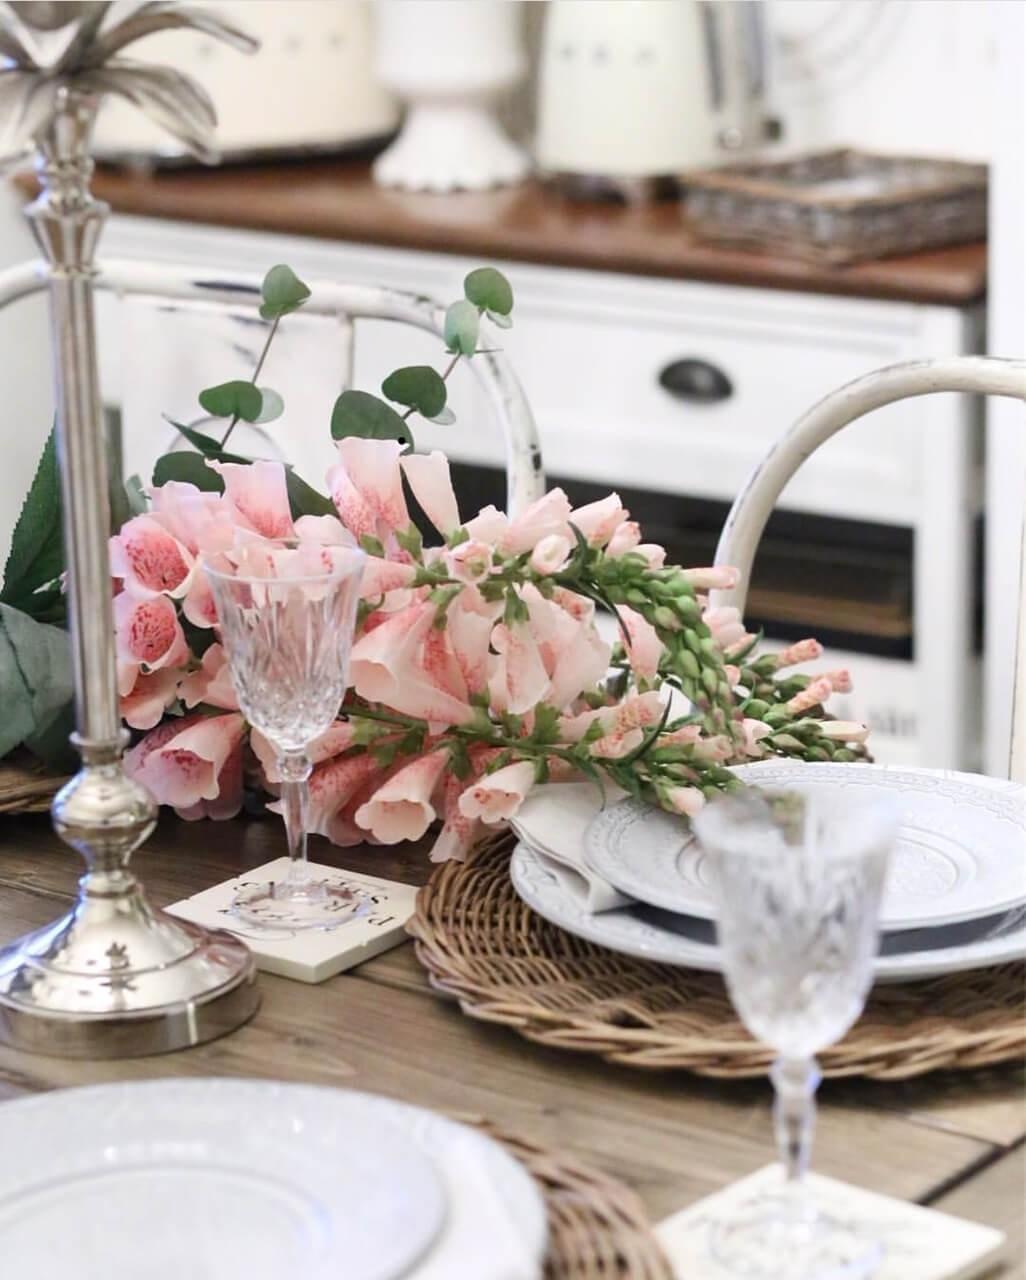 Fingerborgsblomma, rosa, konstgjord blomma